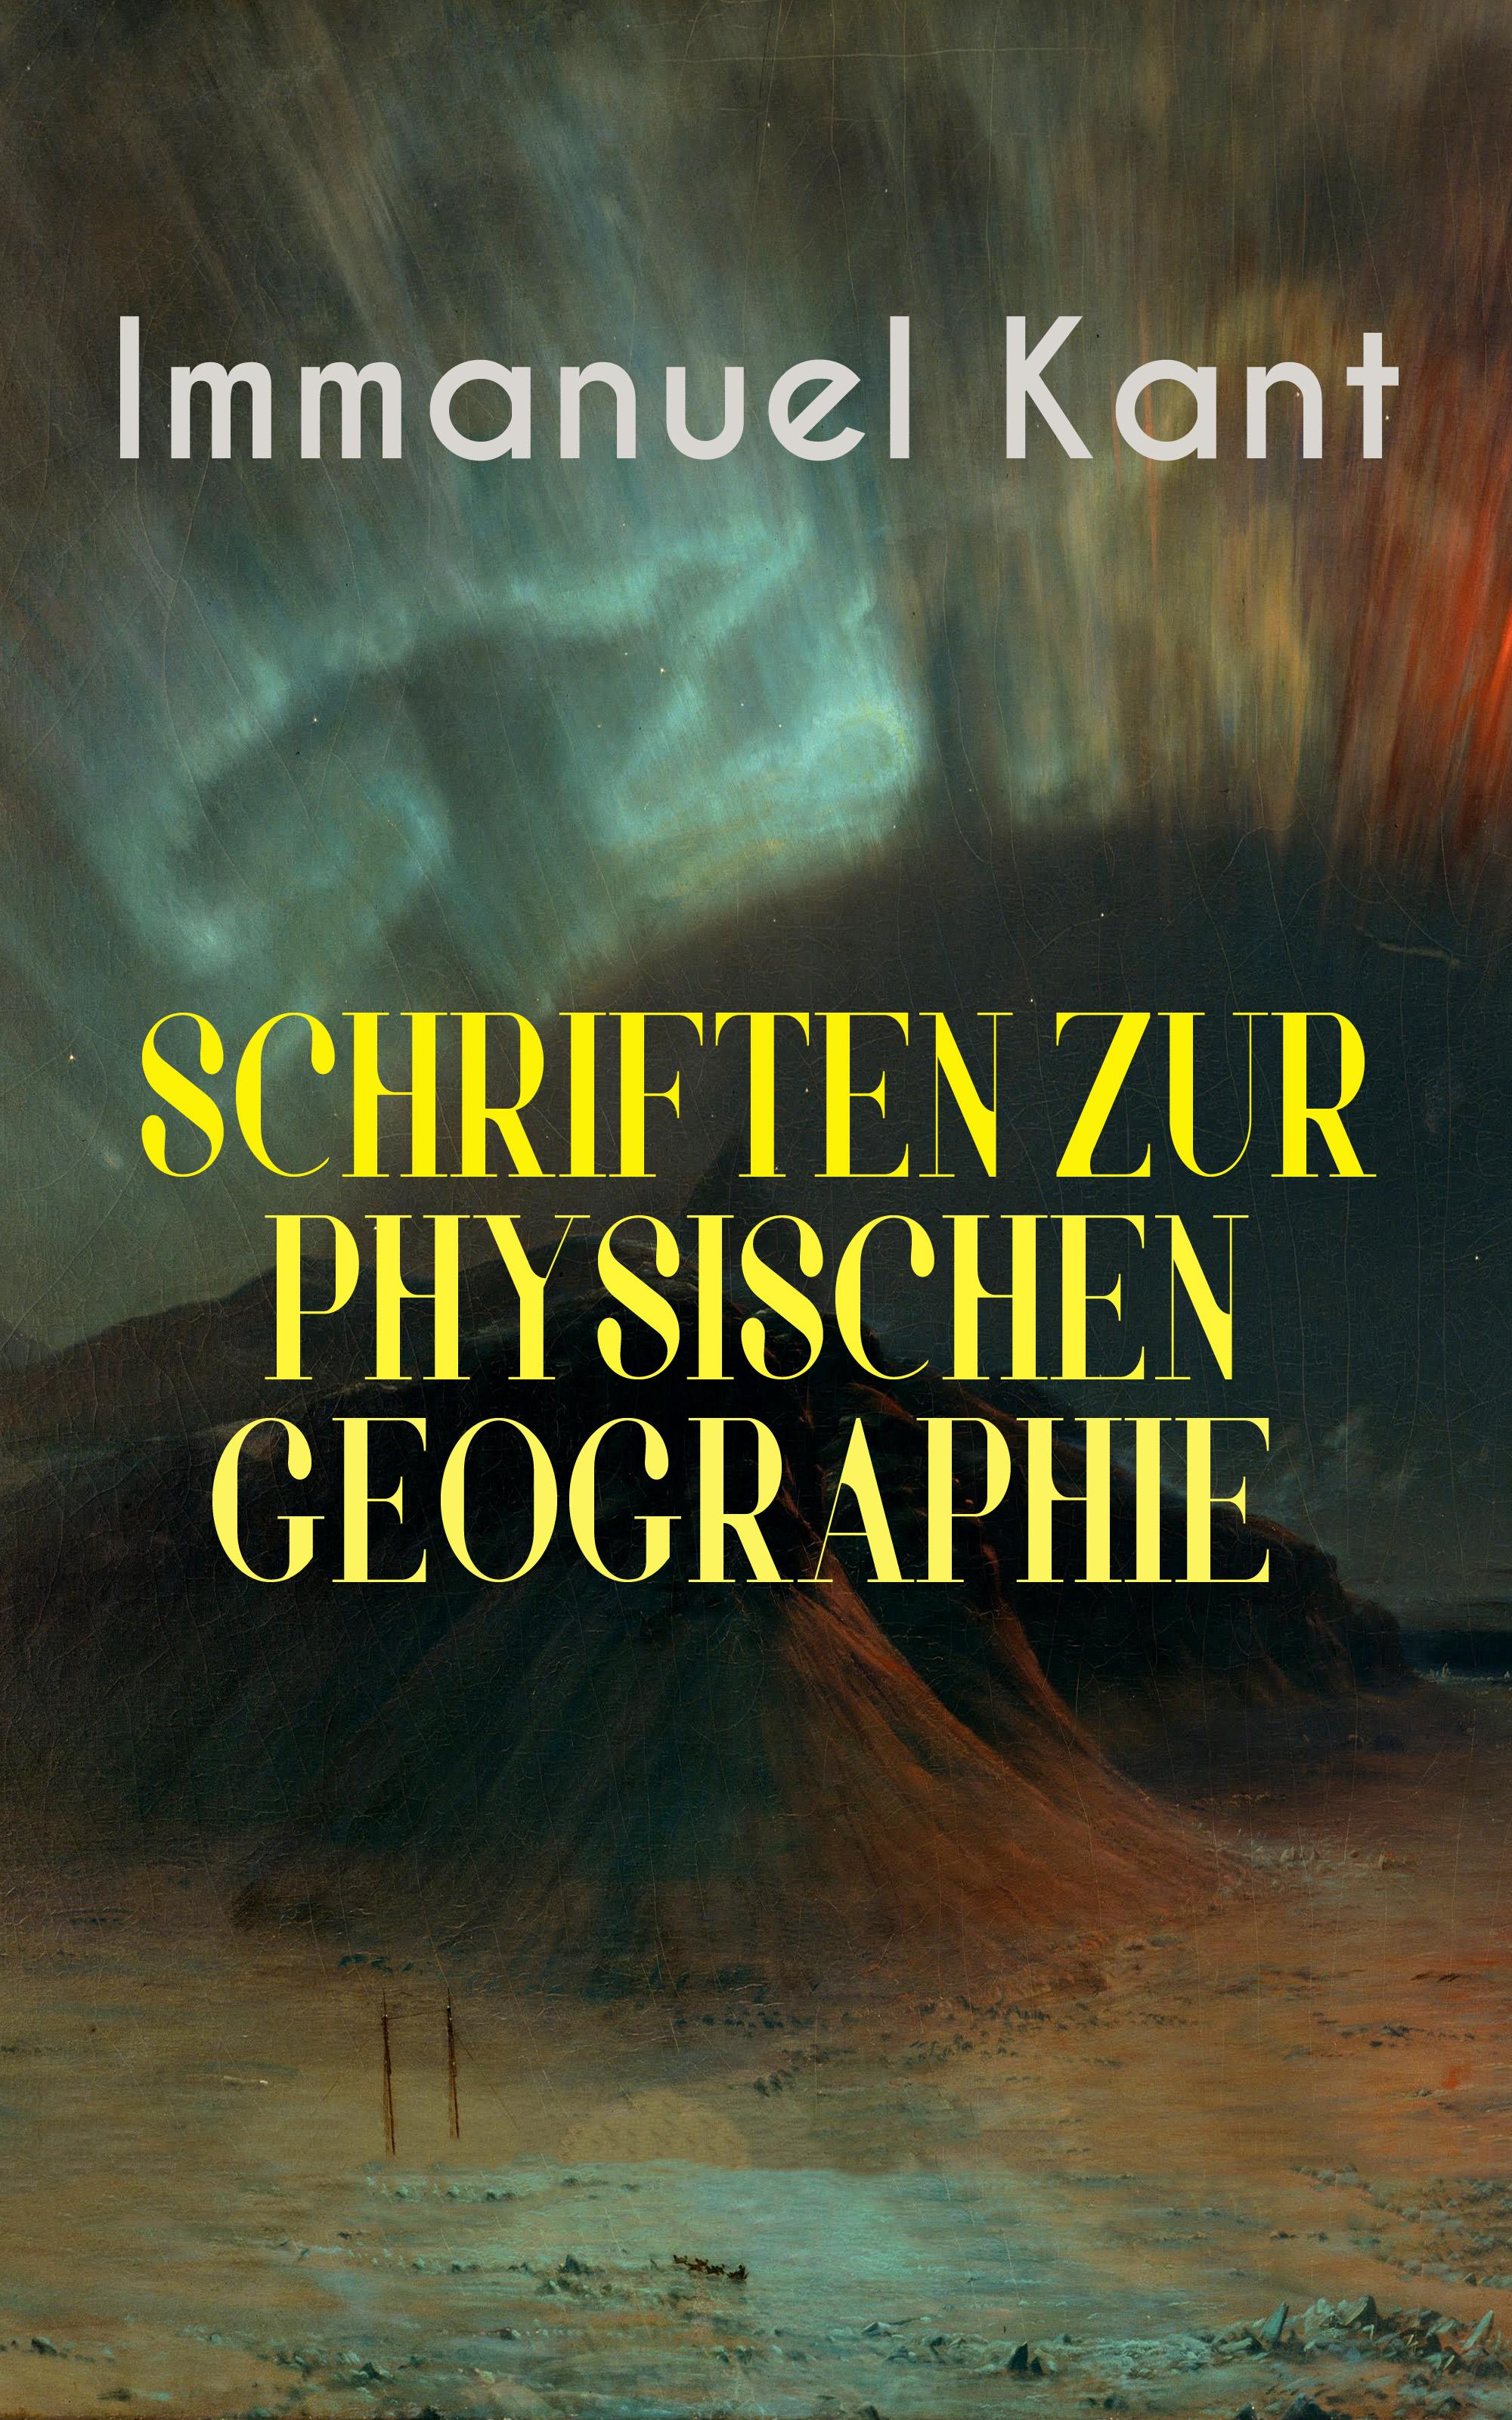 цена на Immanuel Kant Immanuel Kant: Schriften Zur physischen Geographie